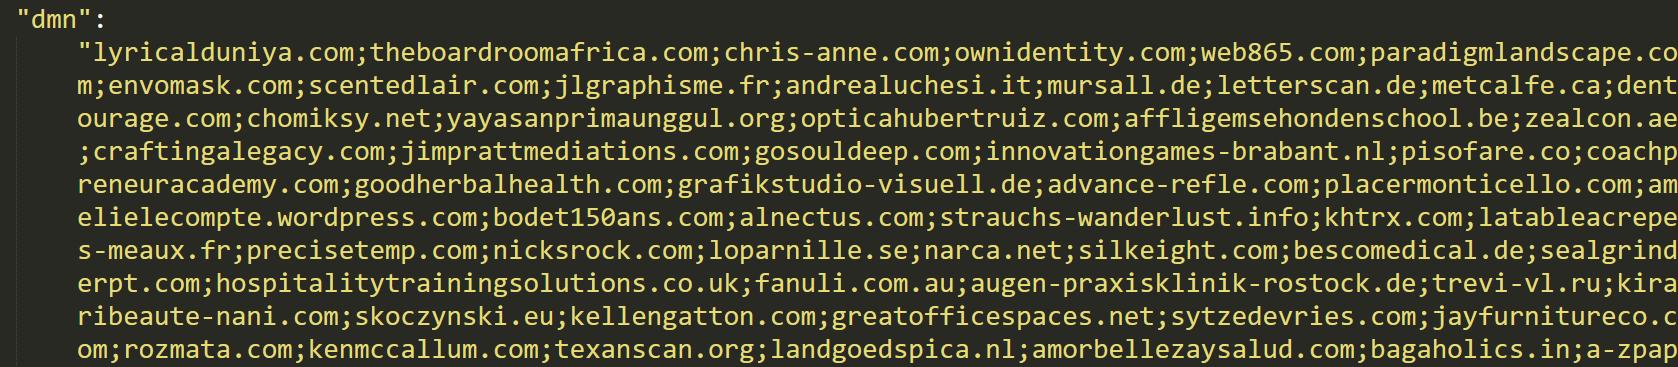 Sodinokibi domain list from the configuration file